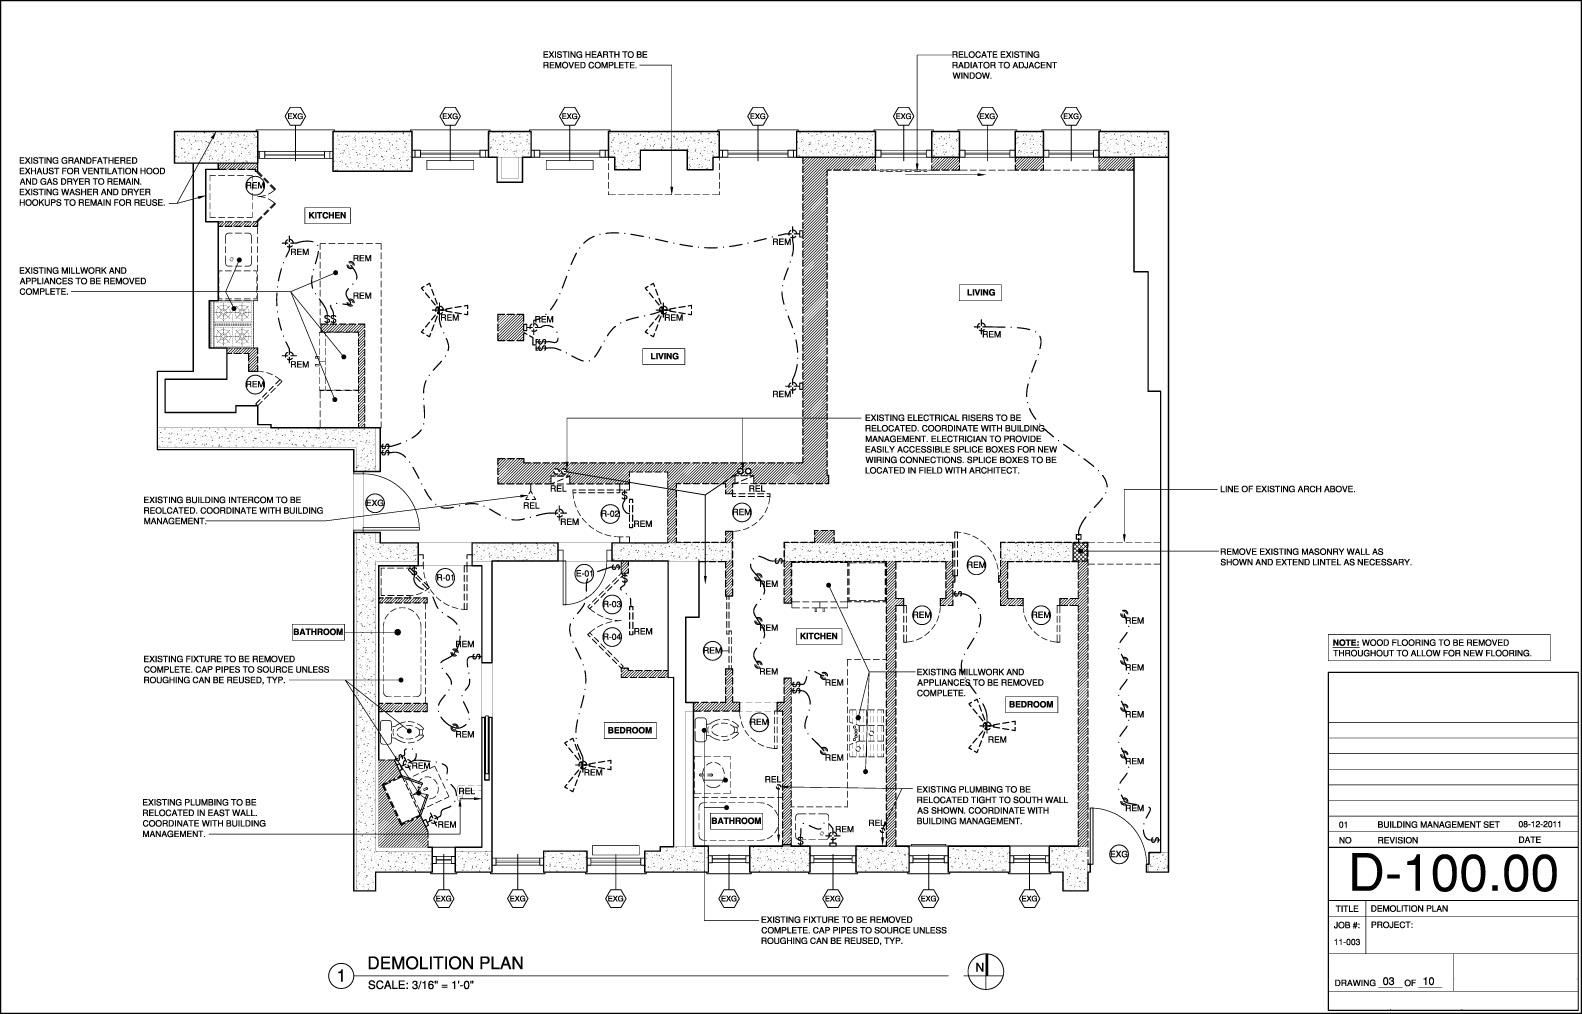 Sun Tect Architecture Design Interiors Combining